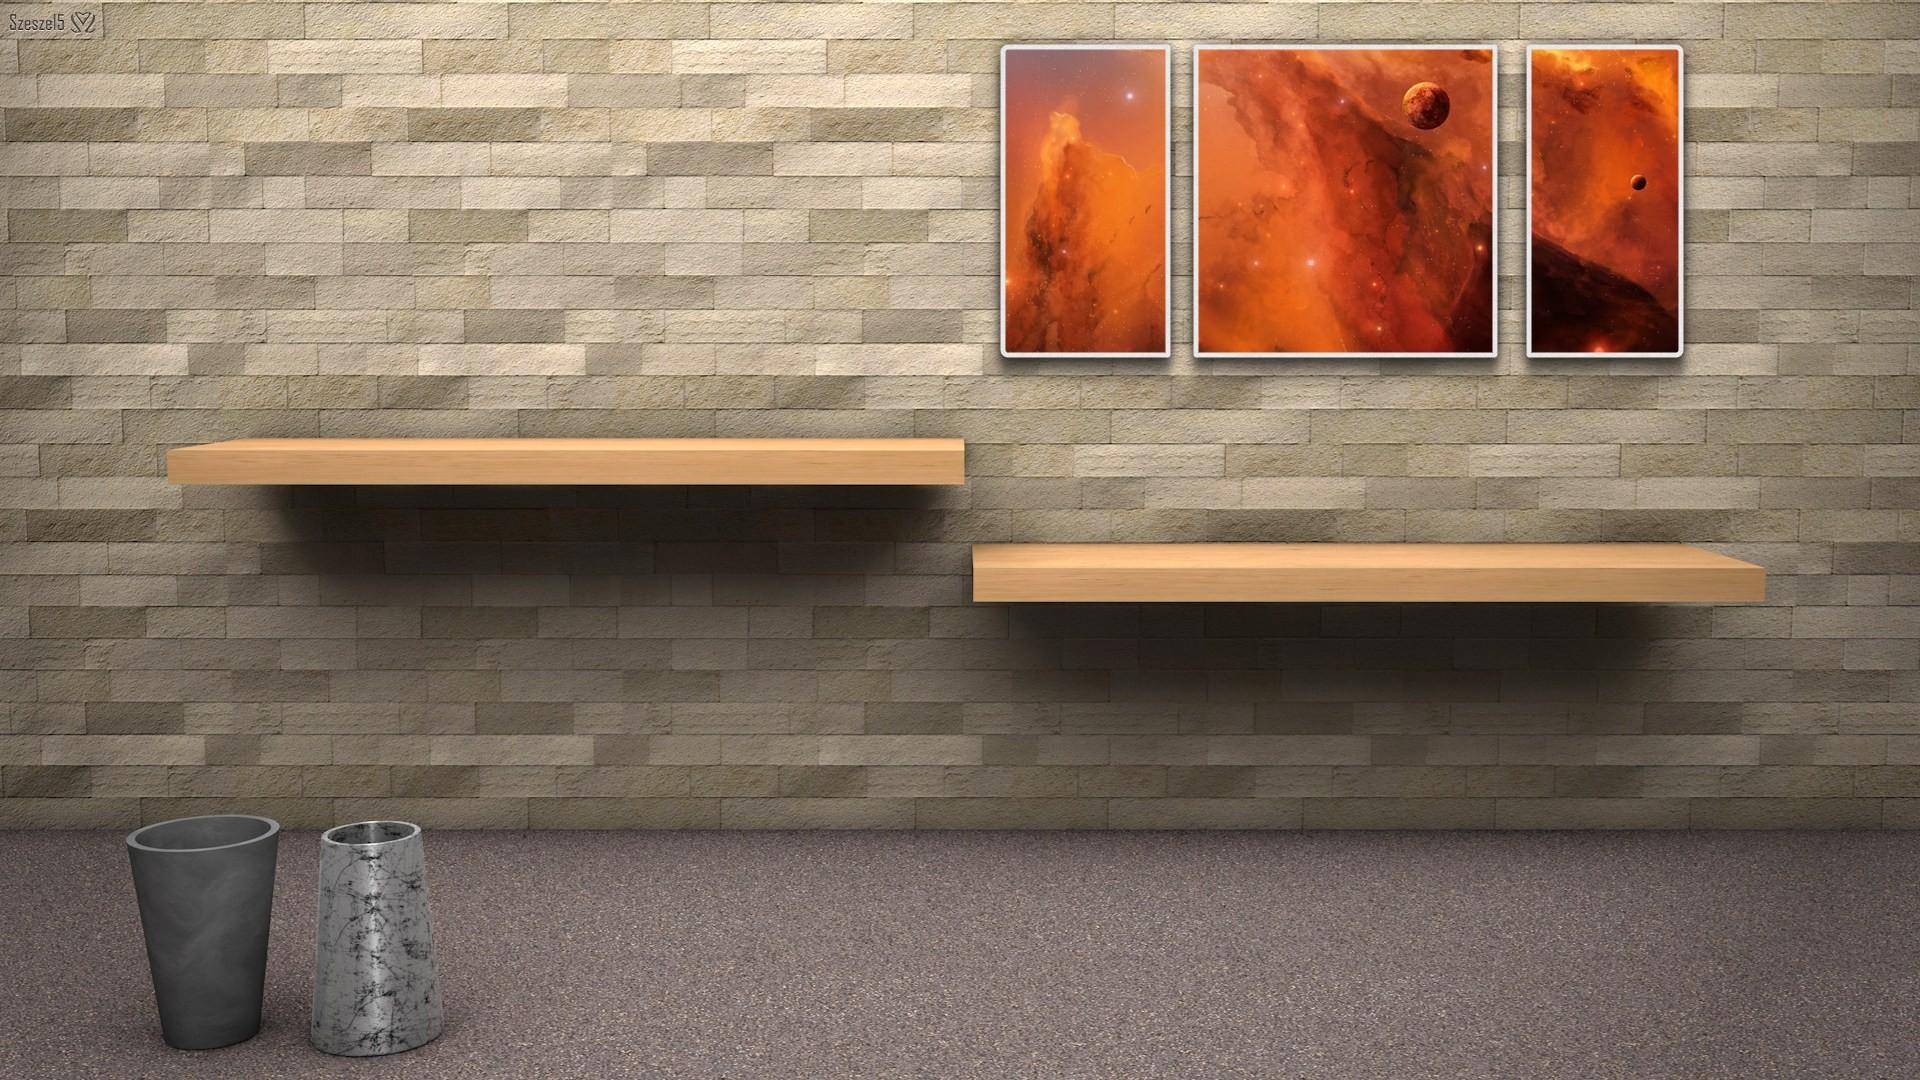 3200x1080 Abstrakt Computer Wallpapers, Desktop Backgrounds | 3200x1080 | ID